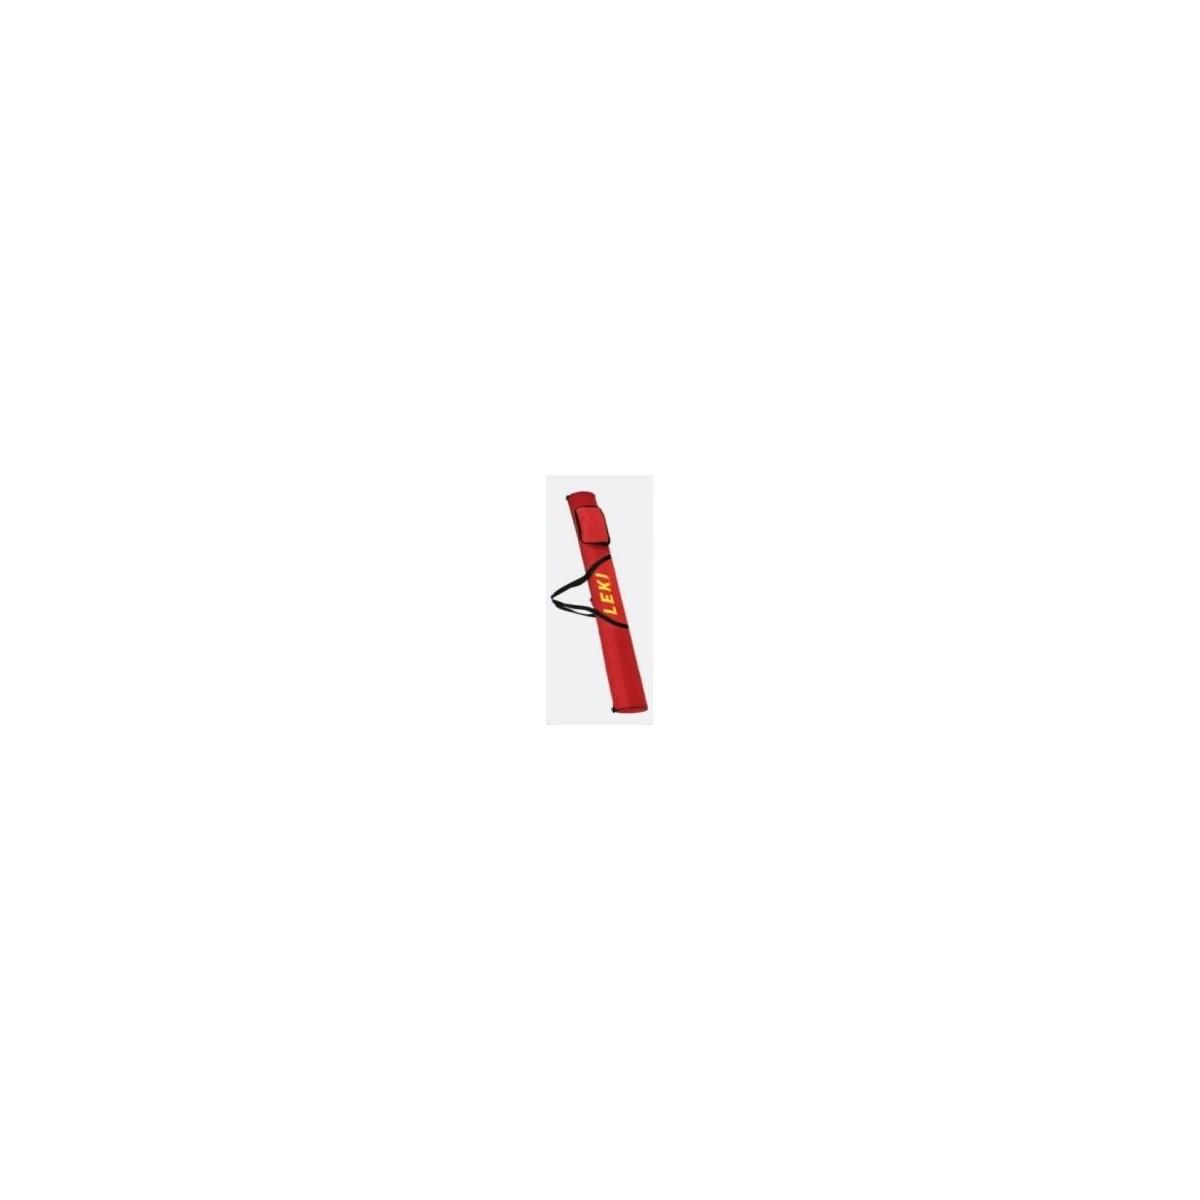 Distanču slēpju un nūju piederumi Leki NW Pole bag